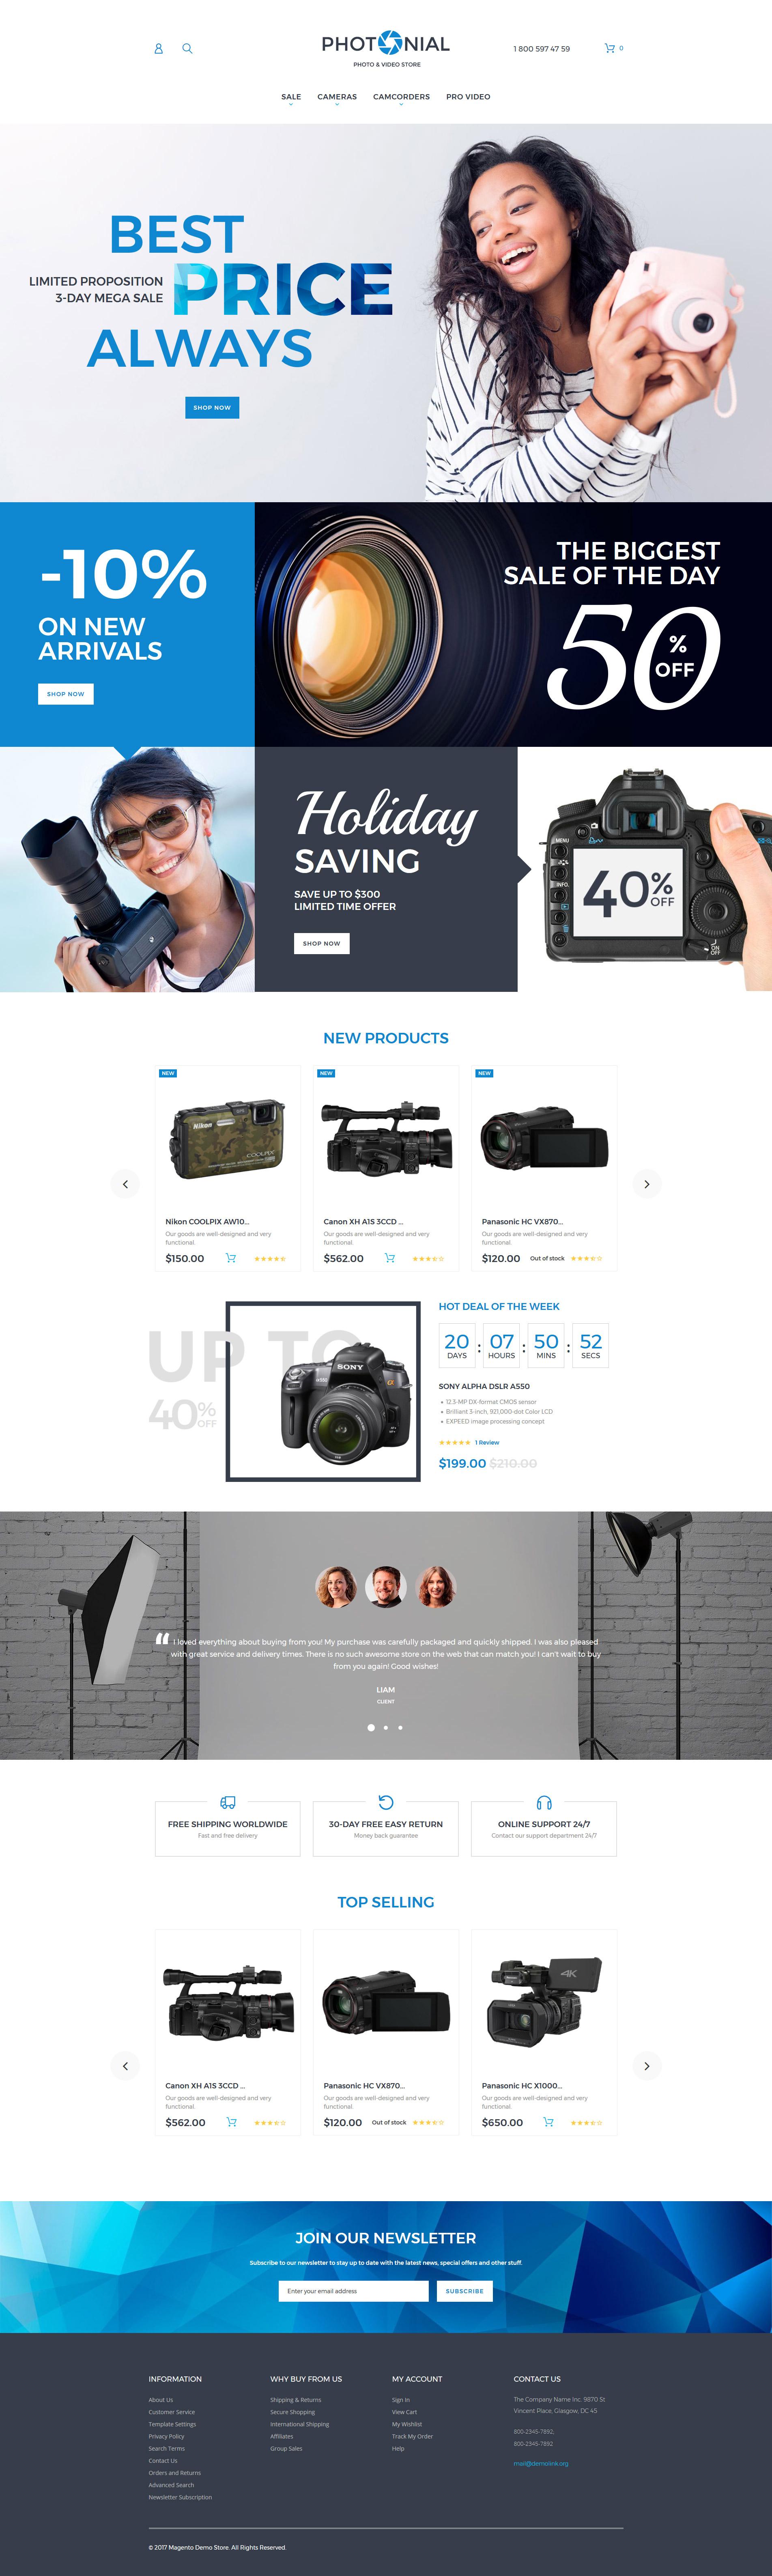 Responsivt Photonial - Photo & Video Store Magento-tema #62097 - skärmbild